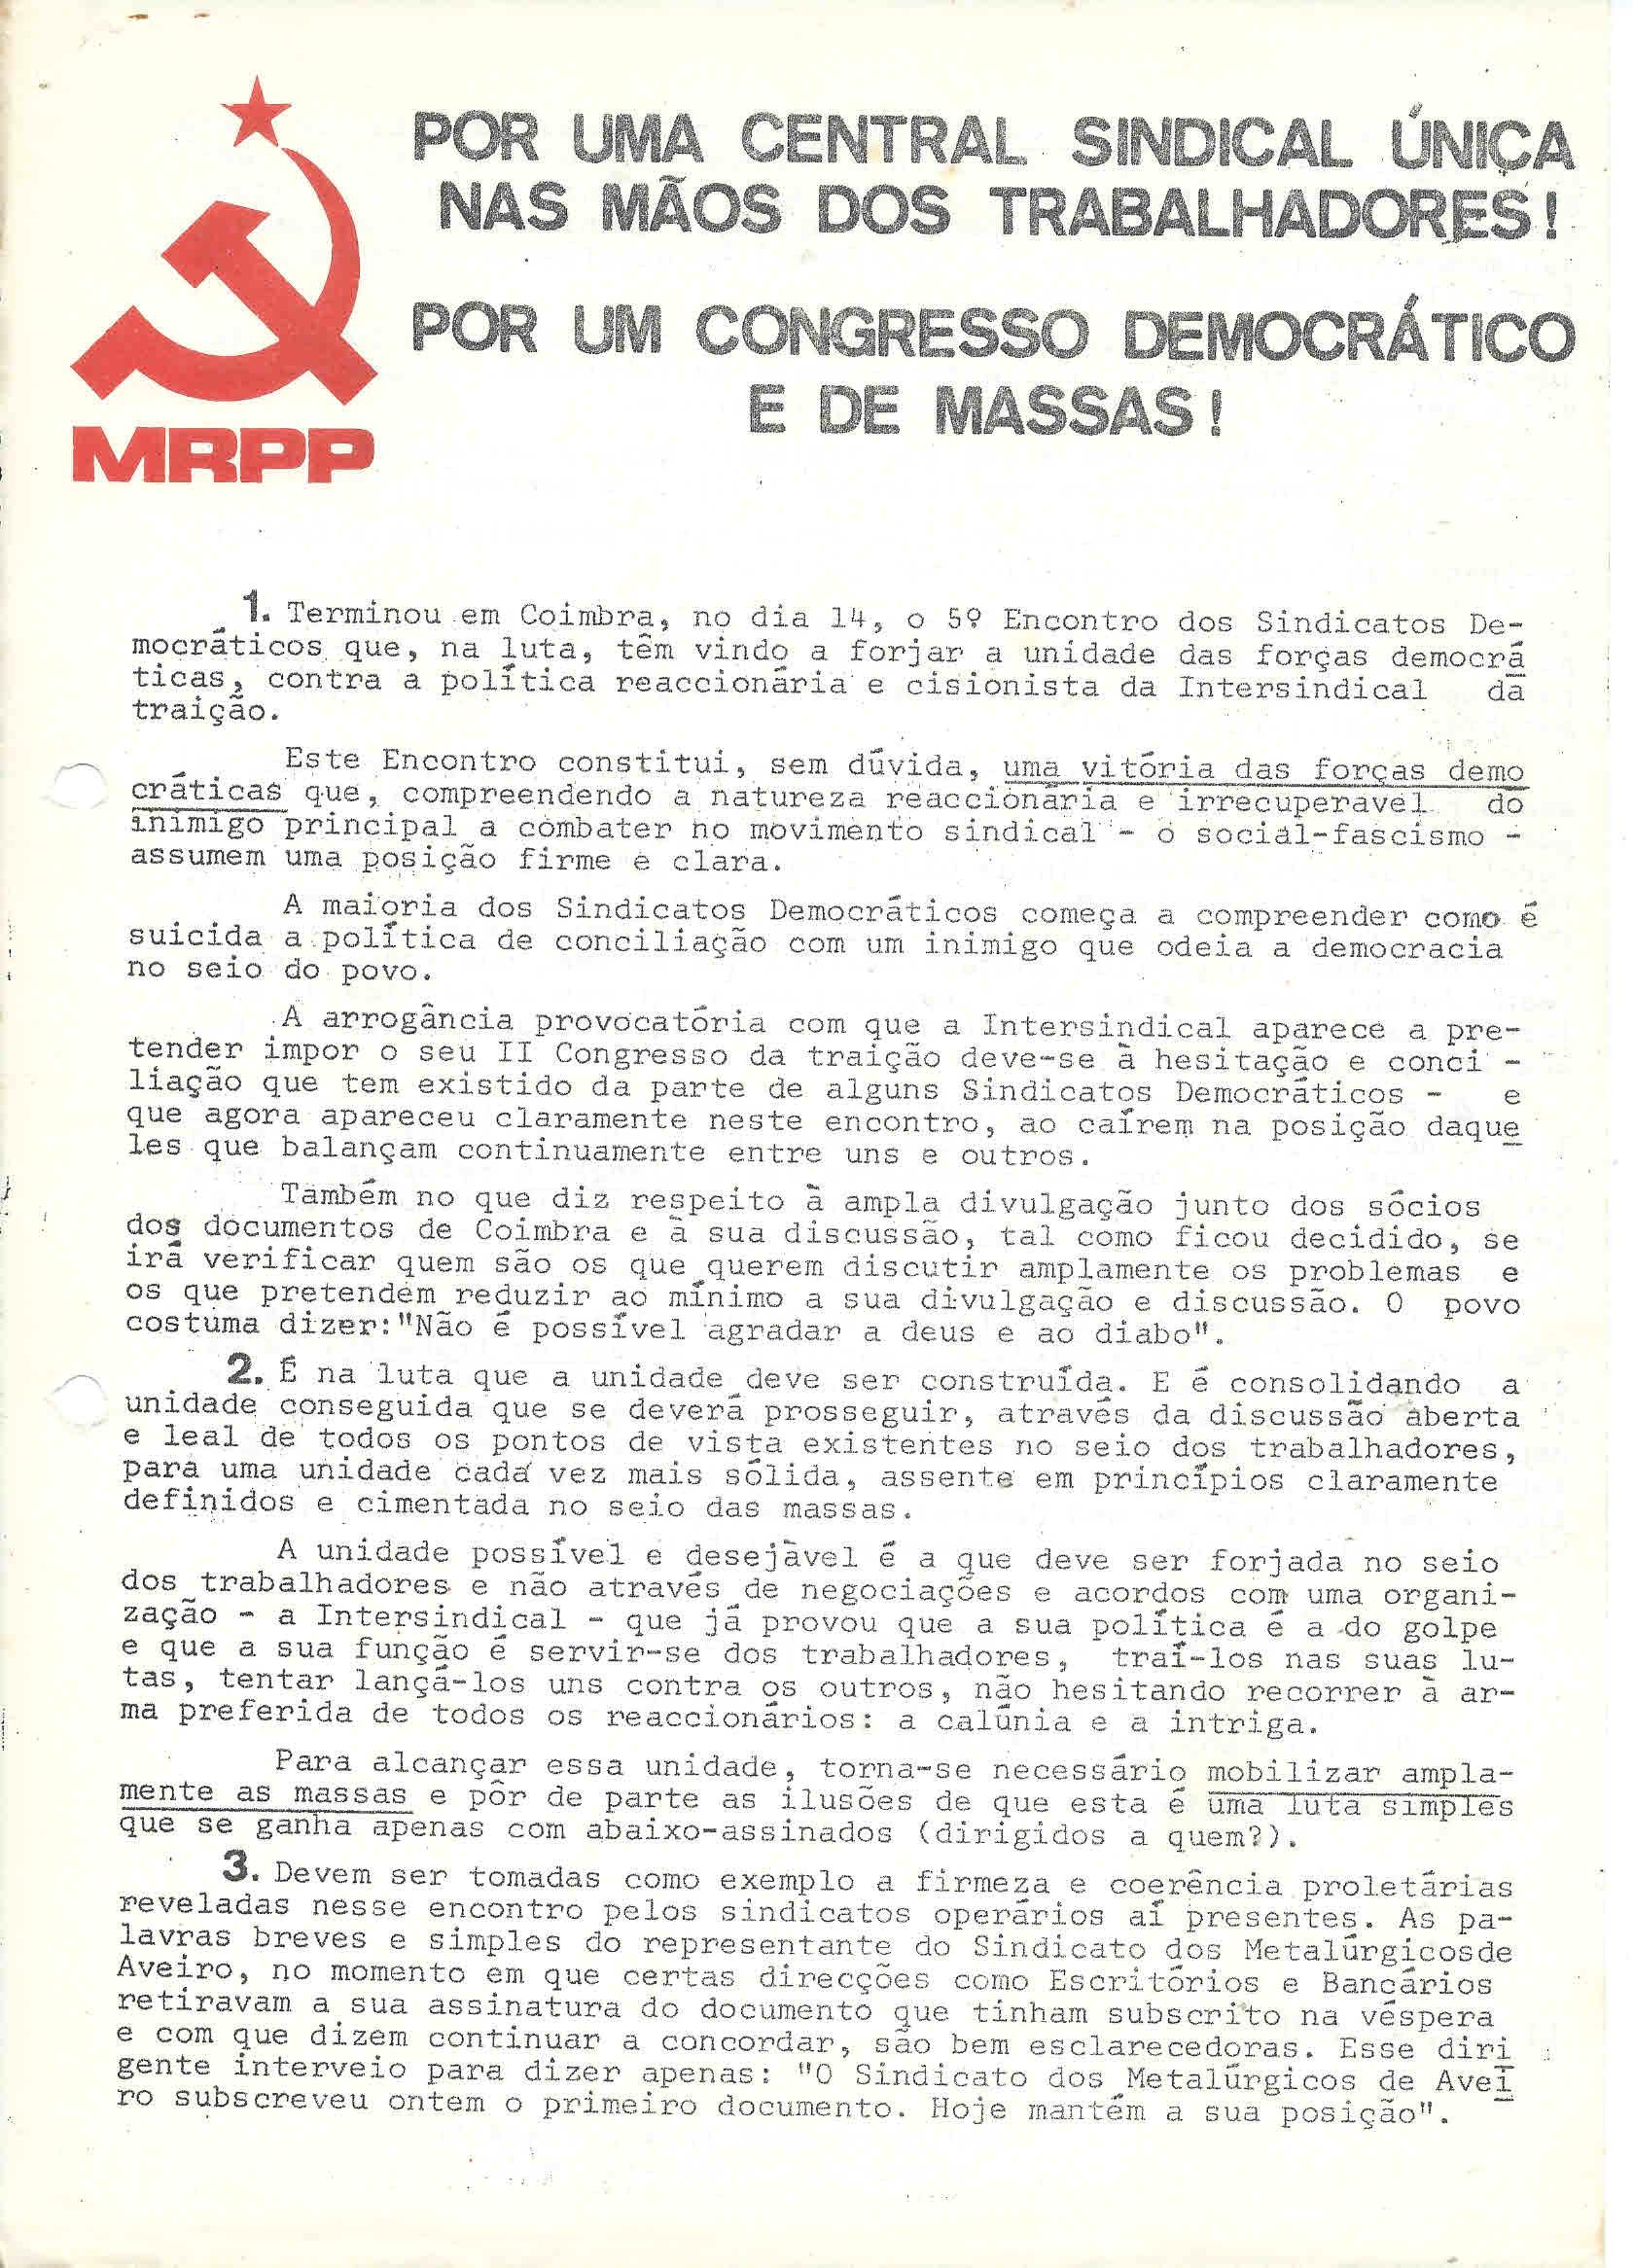 mrpp opor uma central sindical 1976